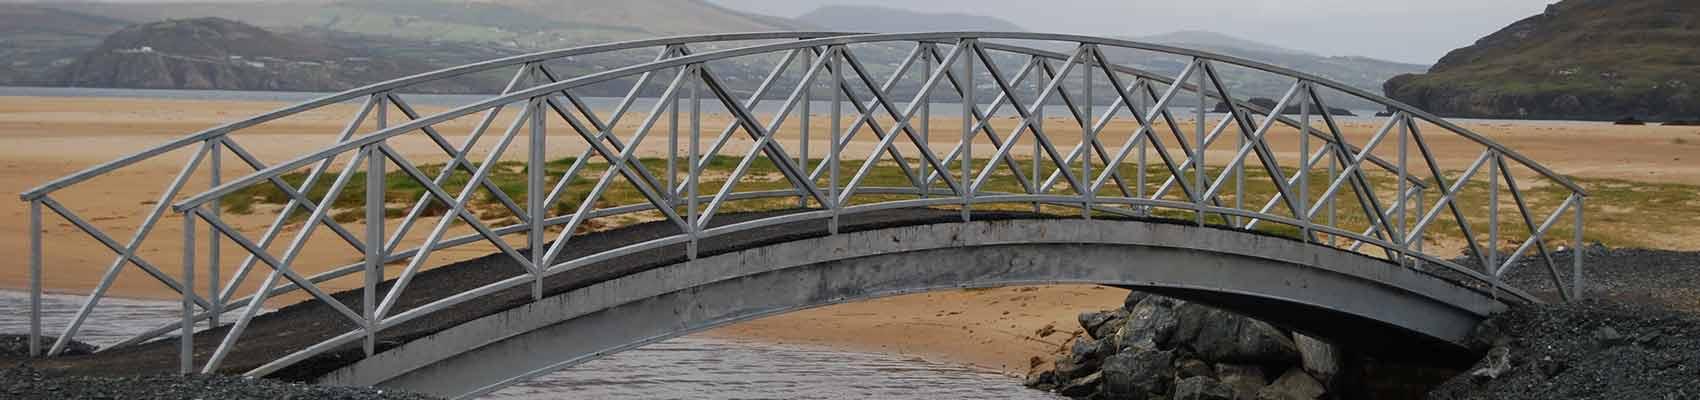 crana_engineering_bridge